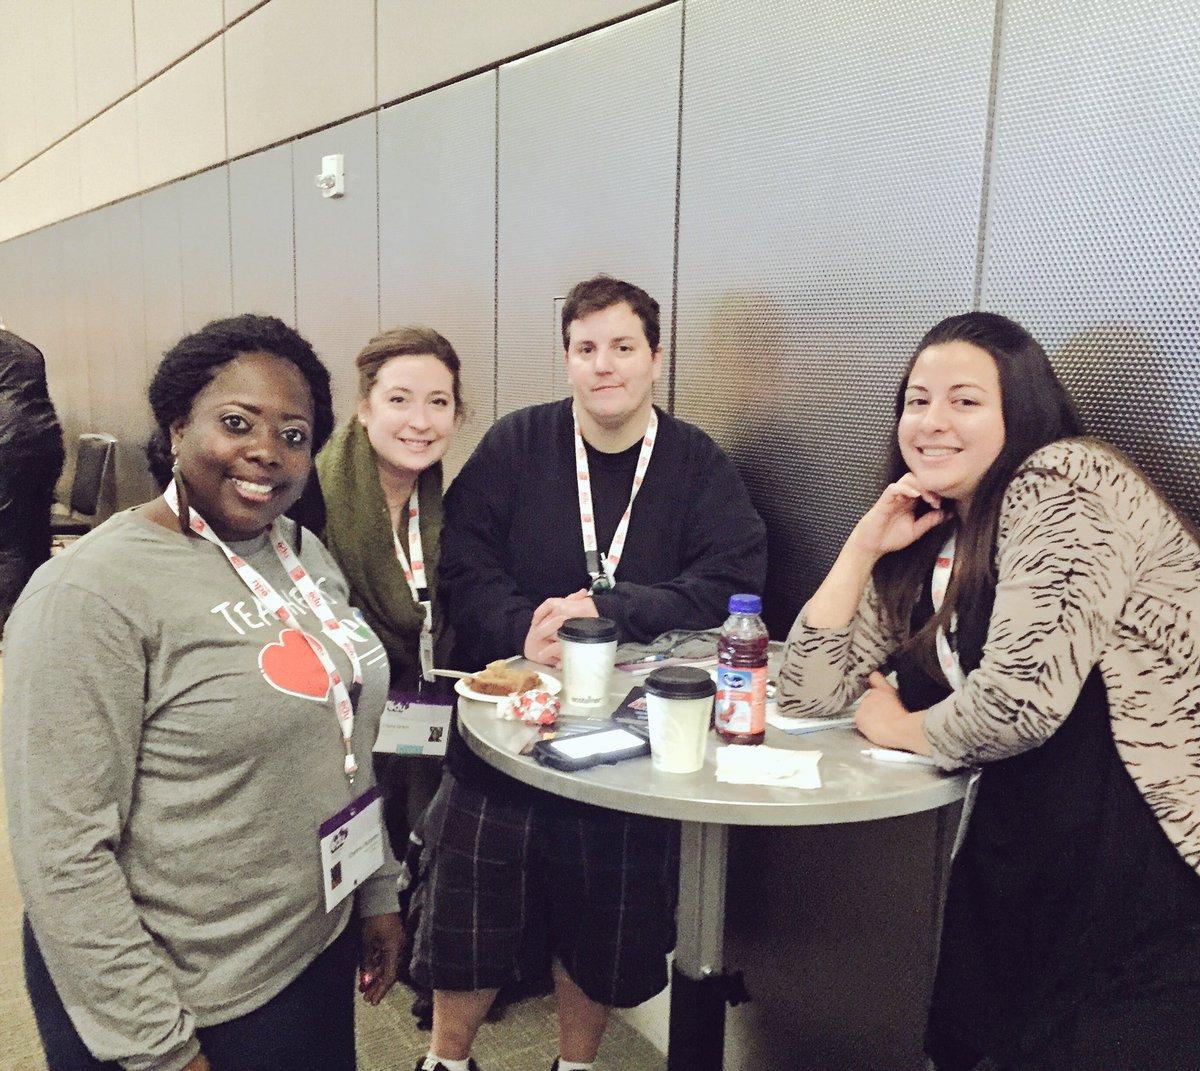 Thanks #TesInnovates yummy breakfast. Meeting new friends. #SXSWedu @AISD_CTE @Darkroom920 @Kharima4 @MlleGrant https://t.co/IQux7f6GF6